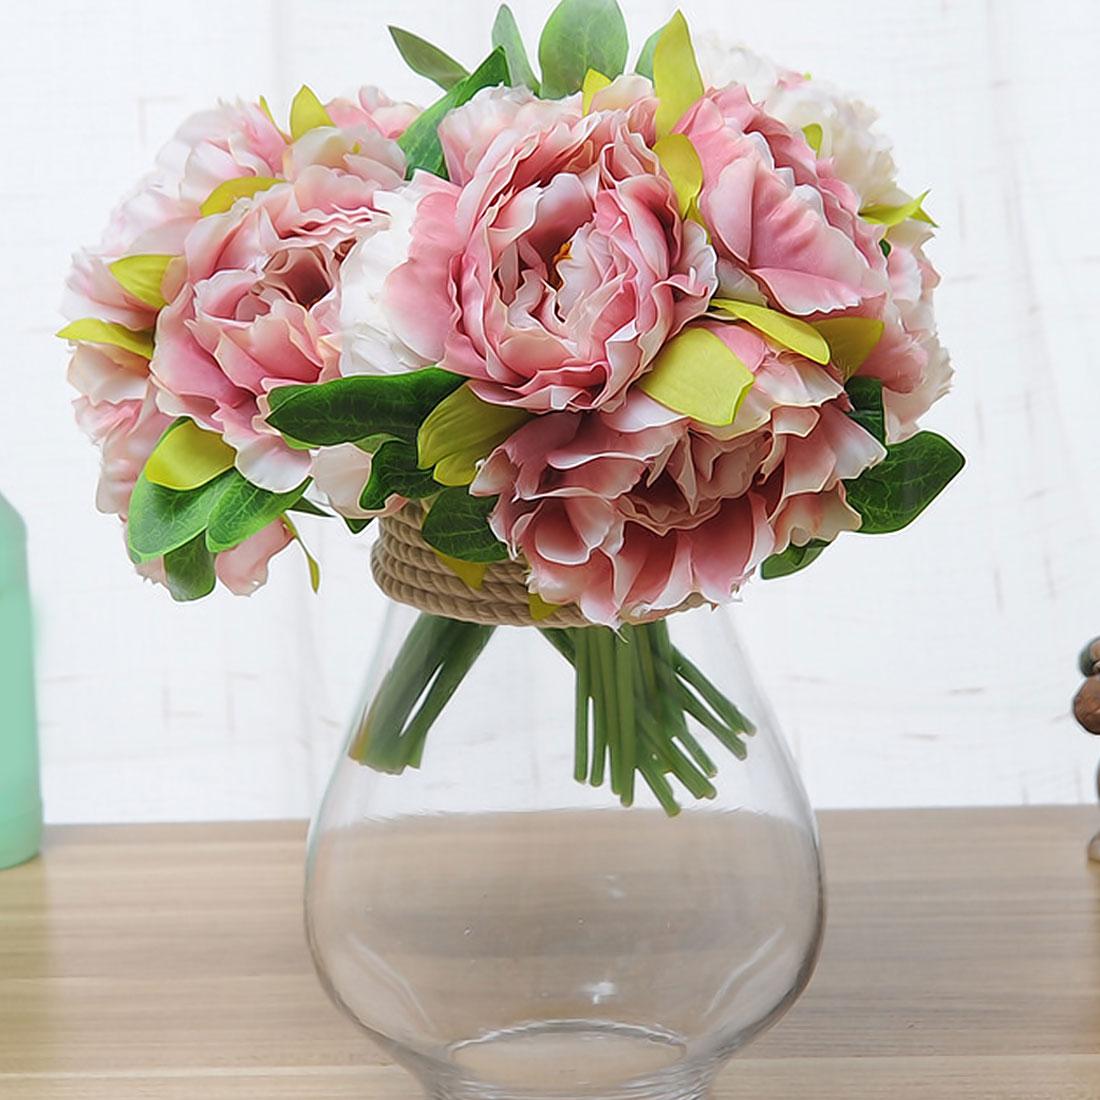 Valentines Day Silk Flower 6 Heads Peony Dahlias Artificial Flowers